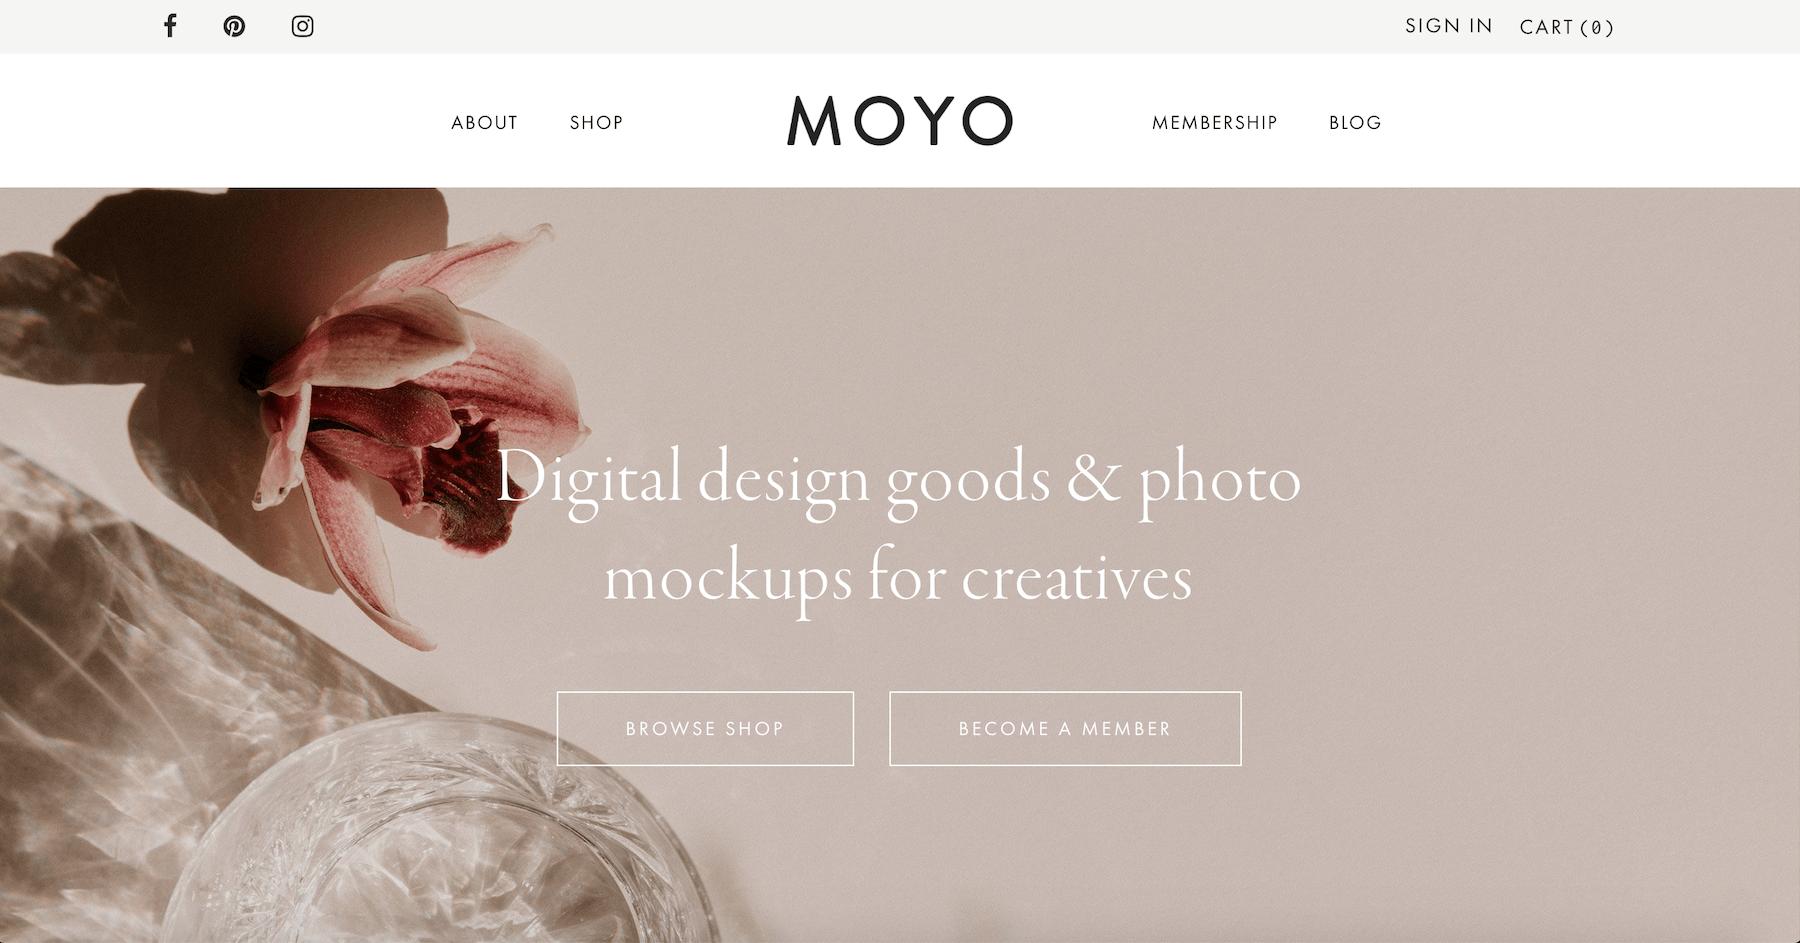 Moyo Studio - Digital Design Goods and Photo Mockups for Creatives